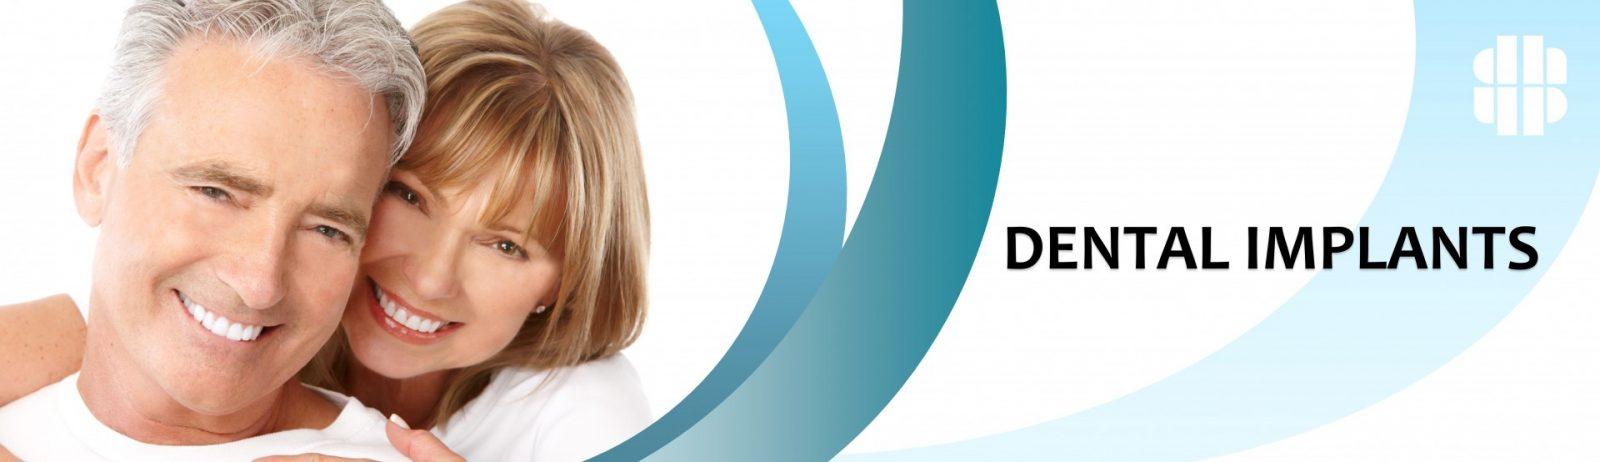 dental implants centre dentistry dentist Brentwood Essex dentist